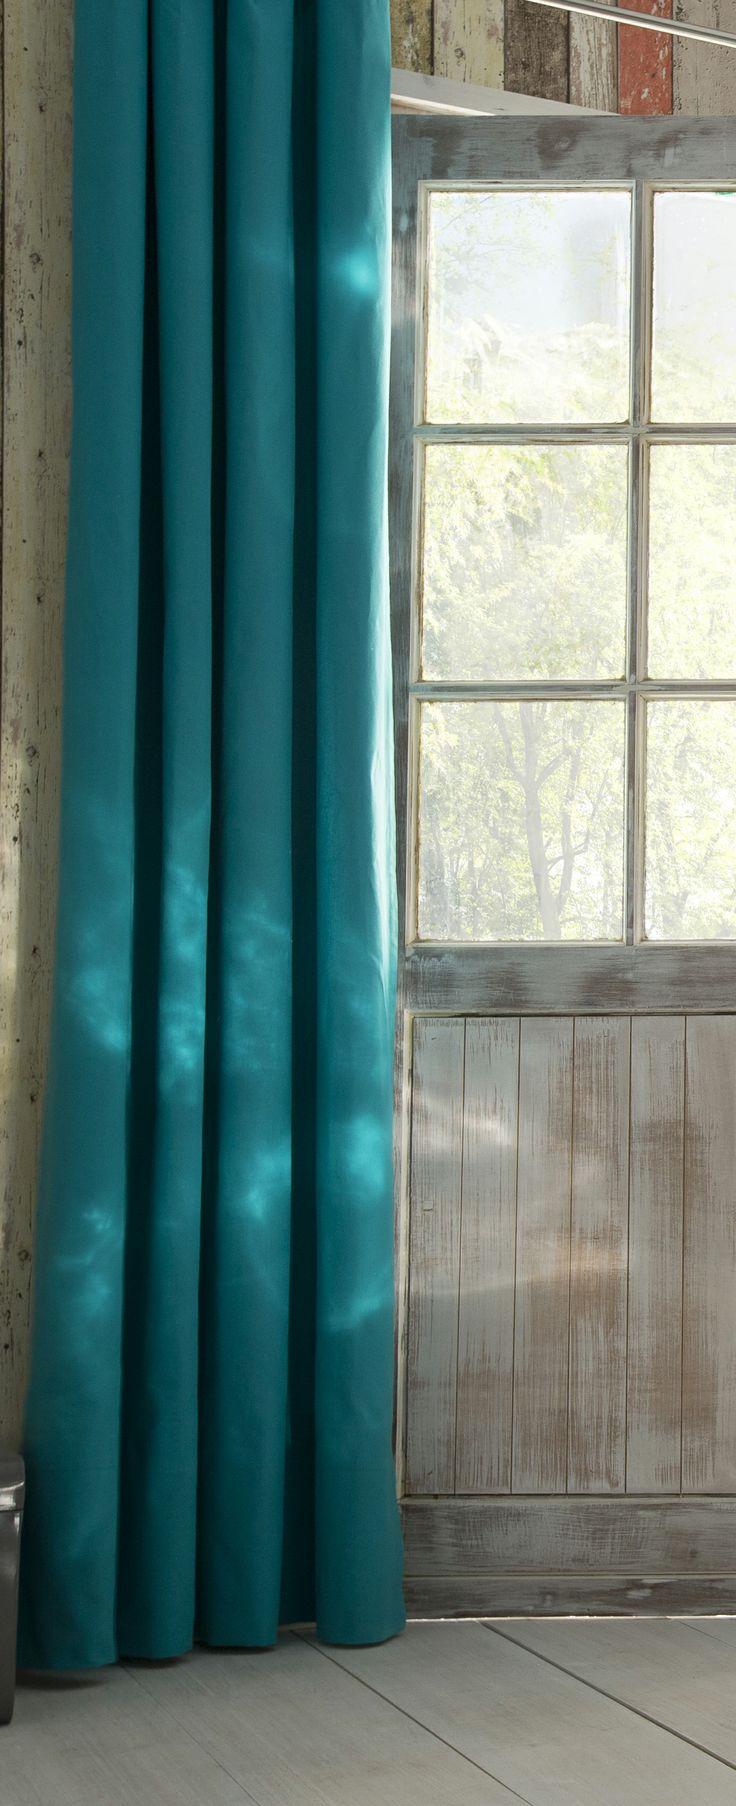 rideaux occultants bleu canard maisonsalon cuisine salle. Black Bedroom Furniture Sets. Home Design Ideas